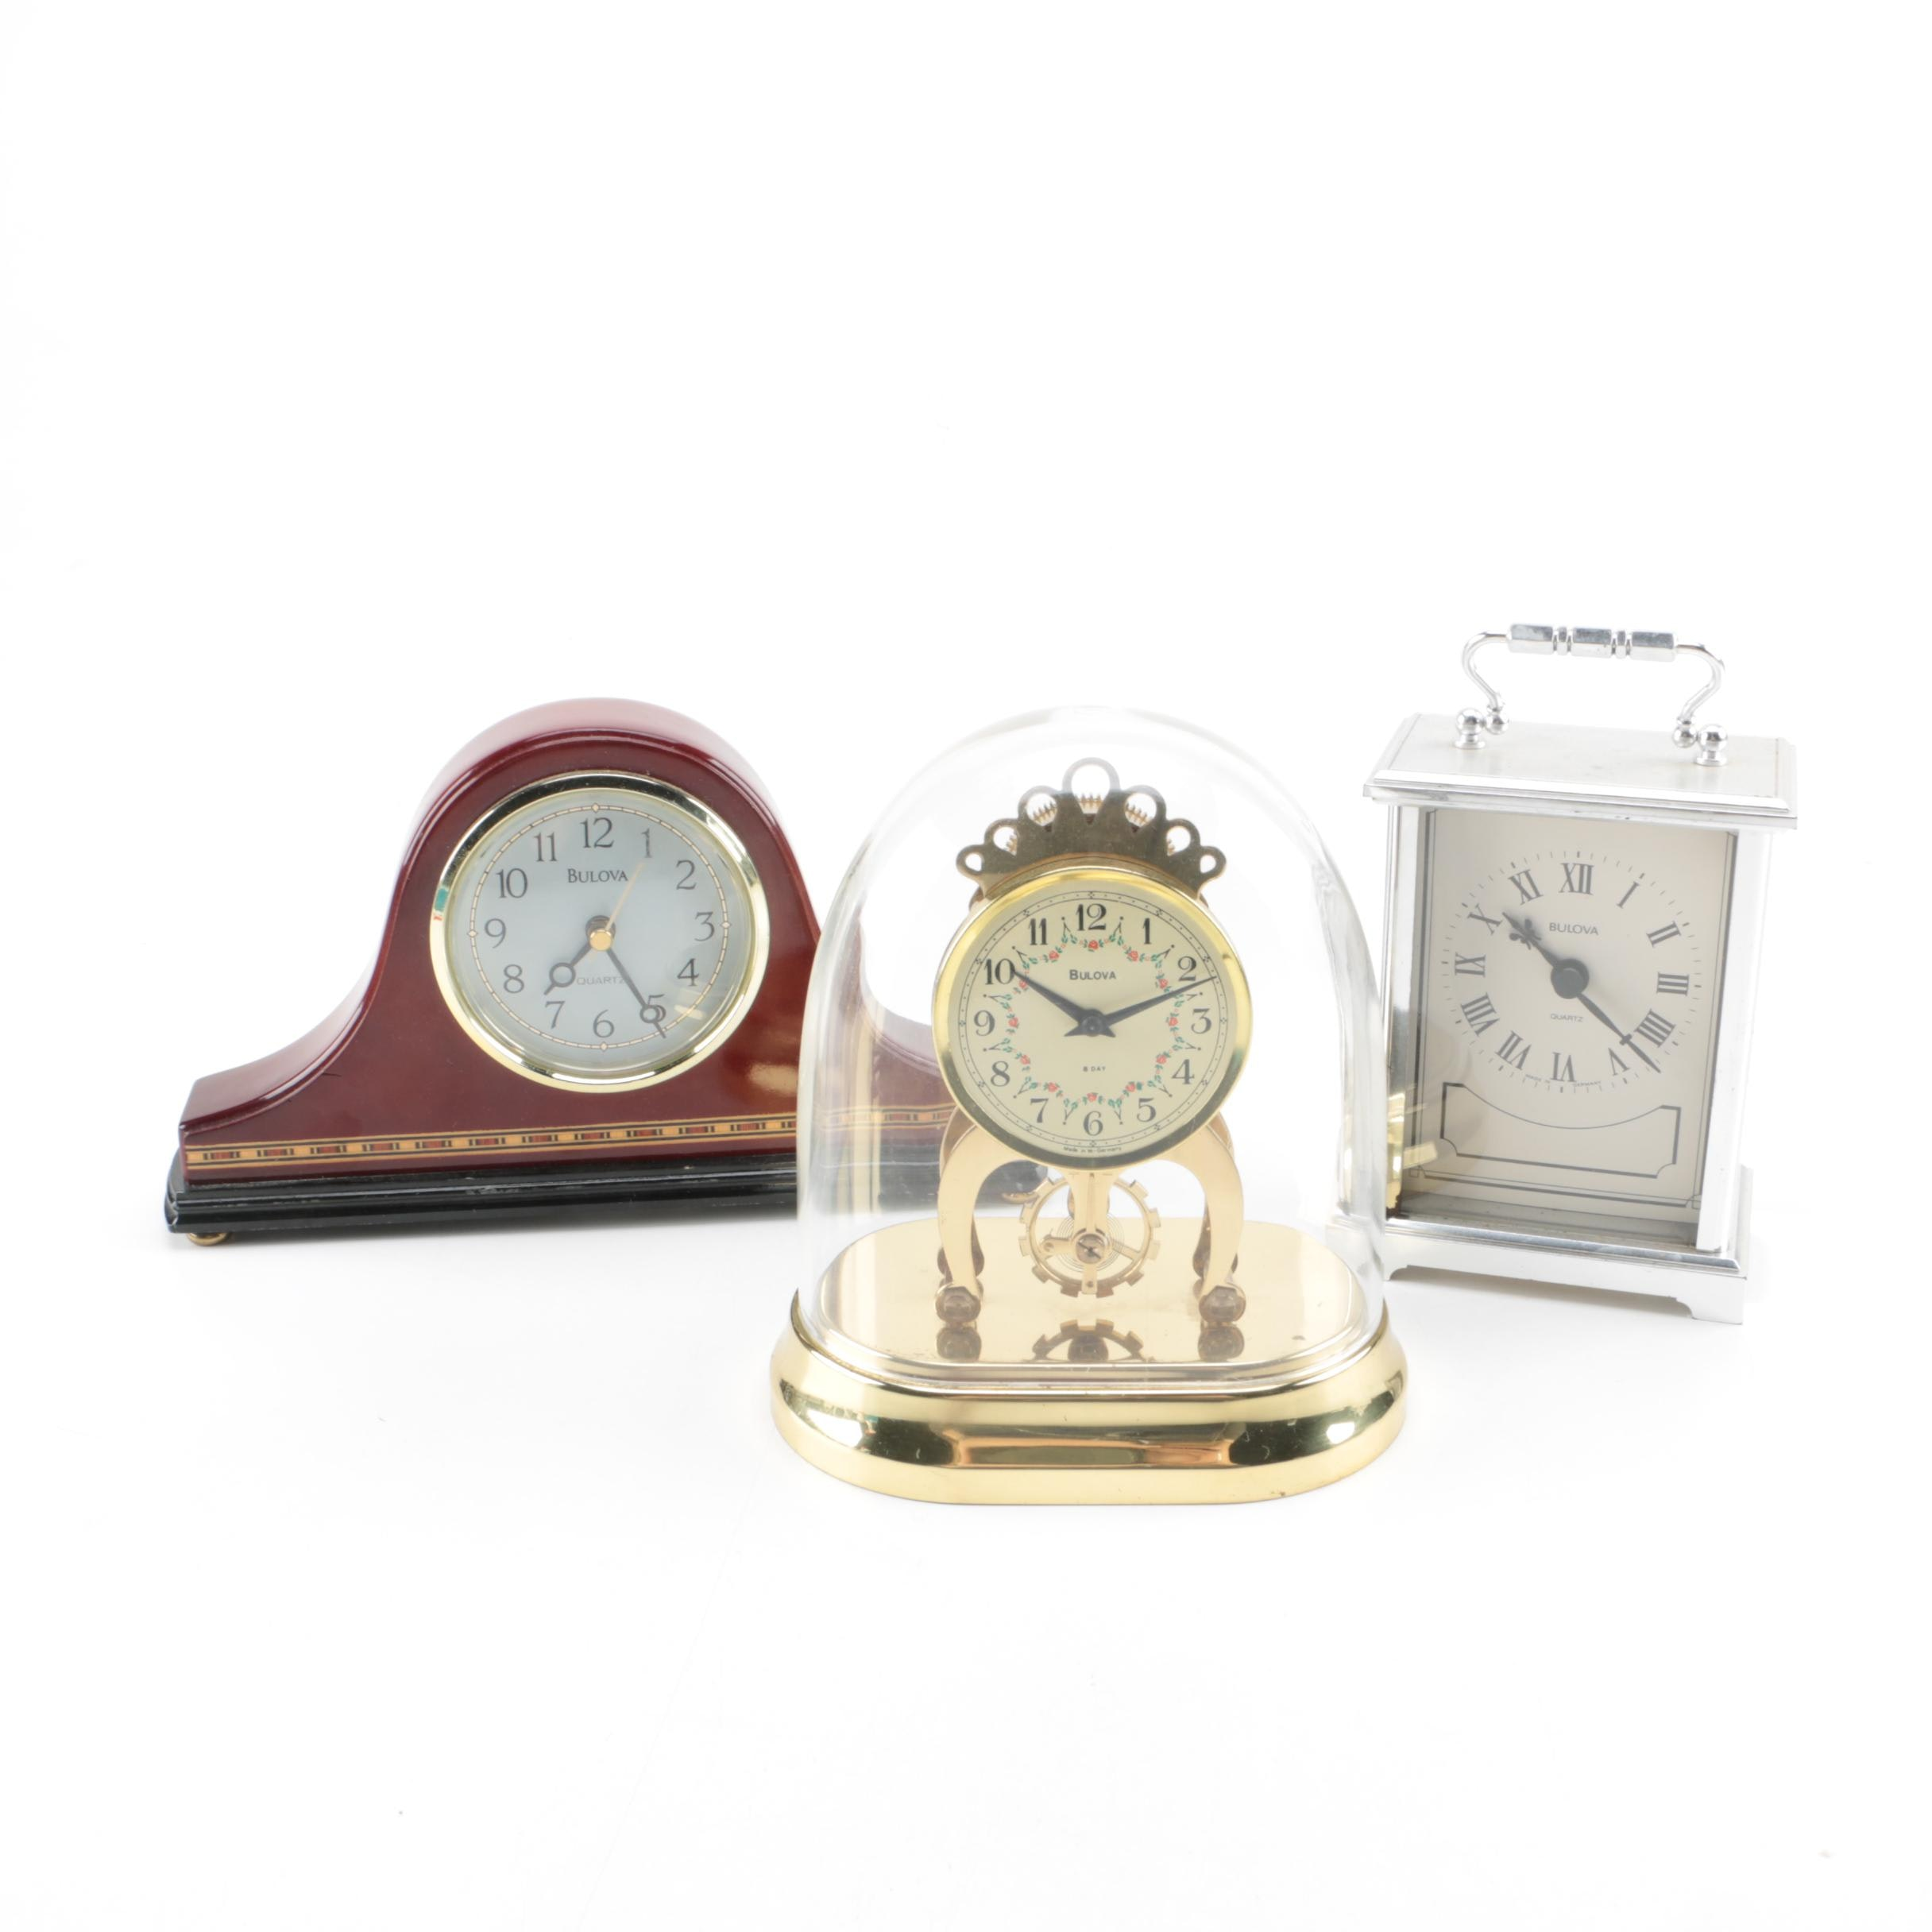 Grouping of Bulova Shelf Clocks